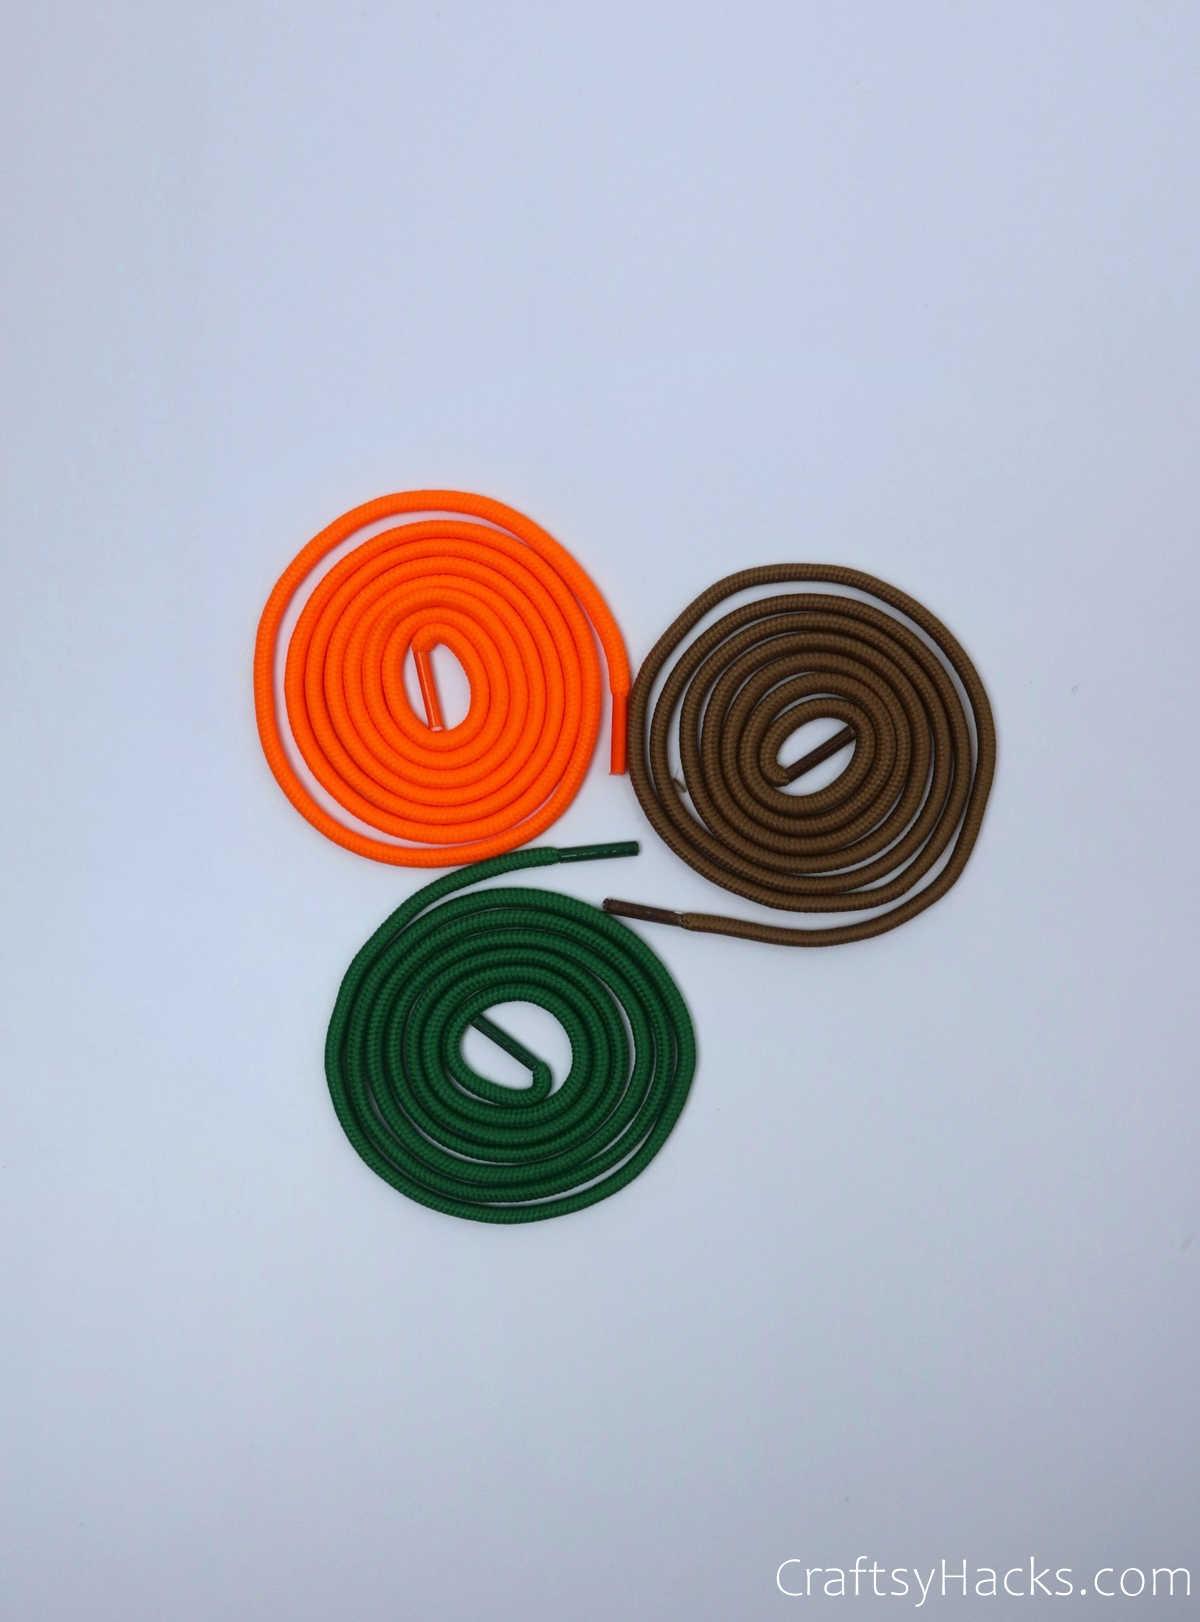 3 colours of shoelaces